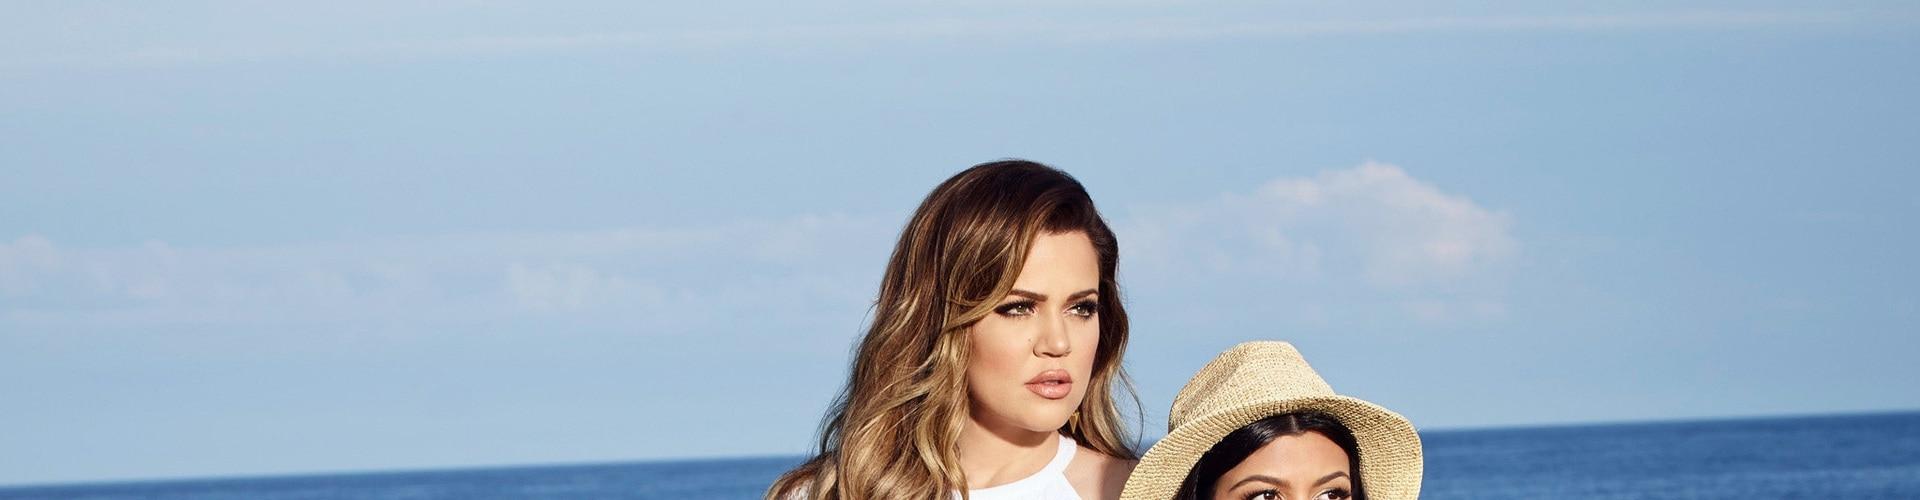 Watch Kourtney & Khloe Take the Hamptons Online